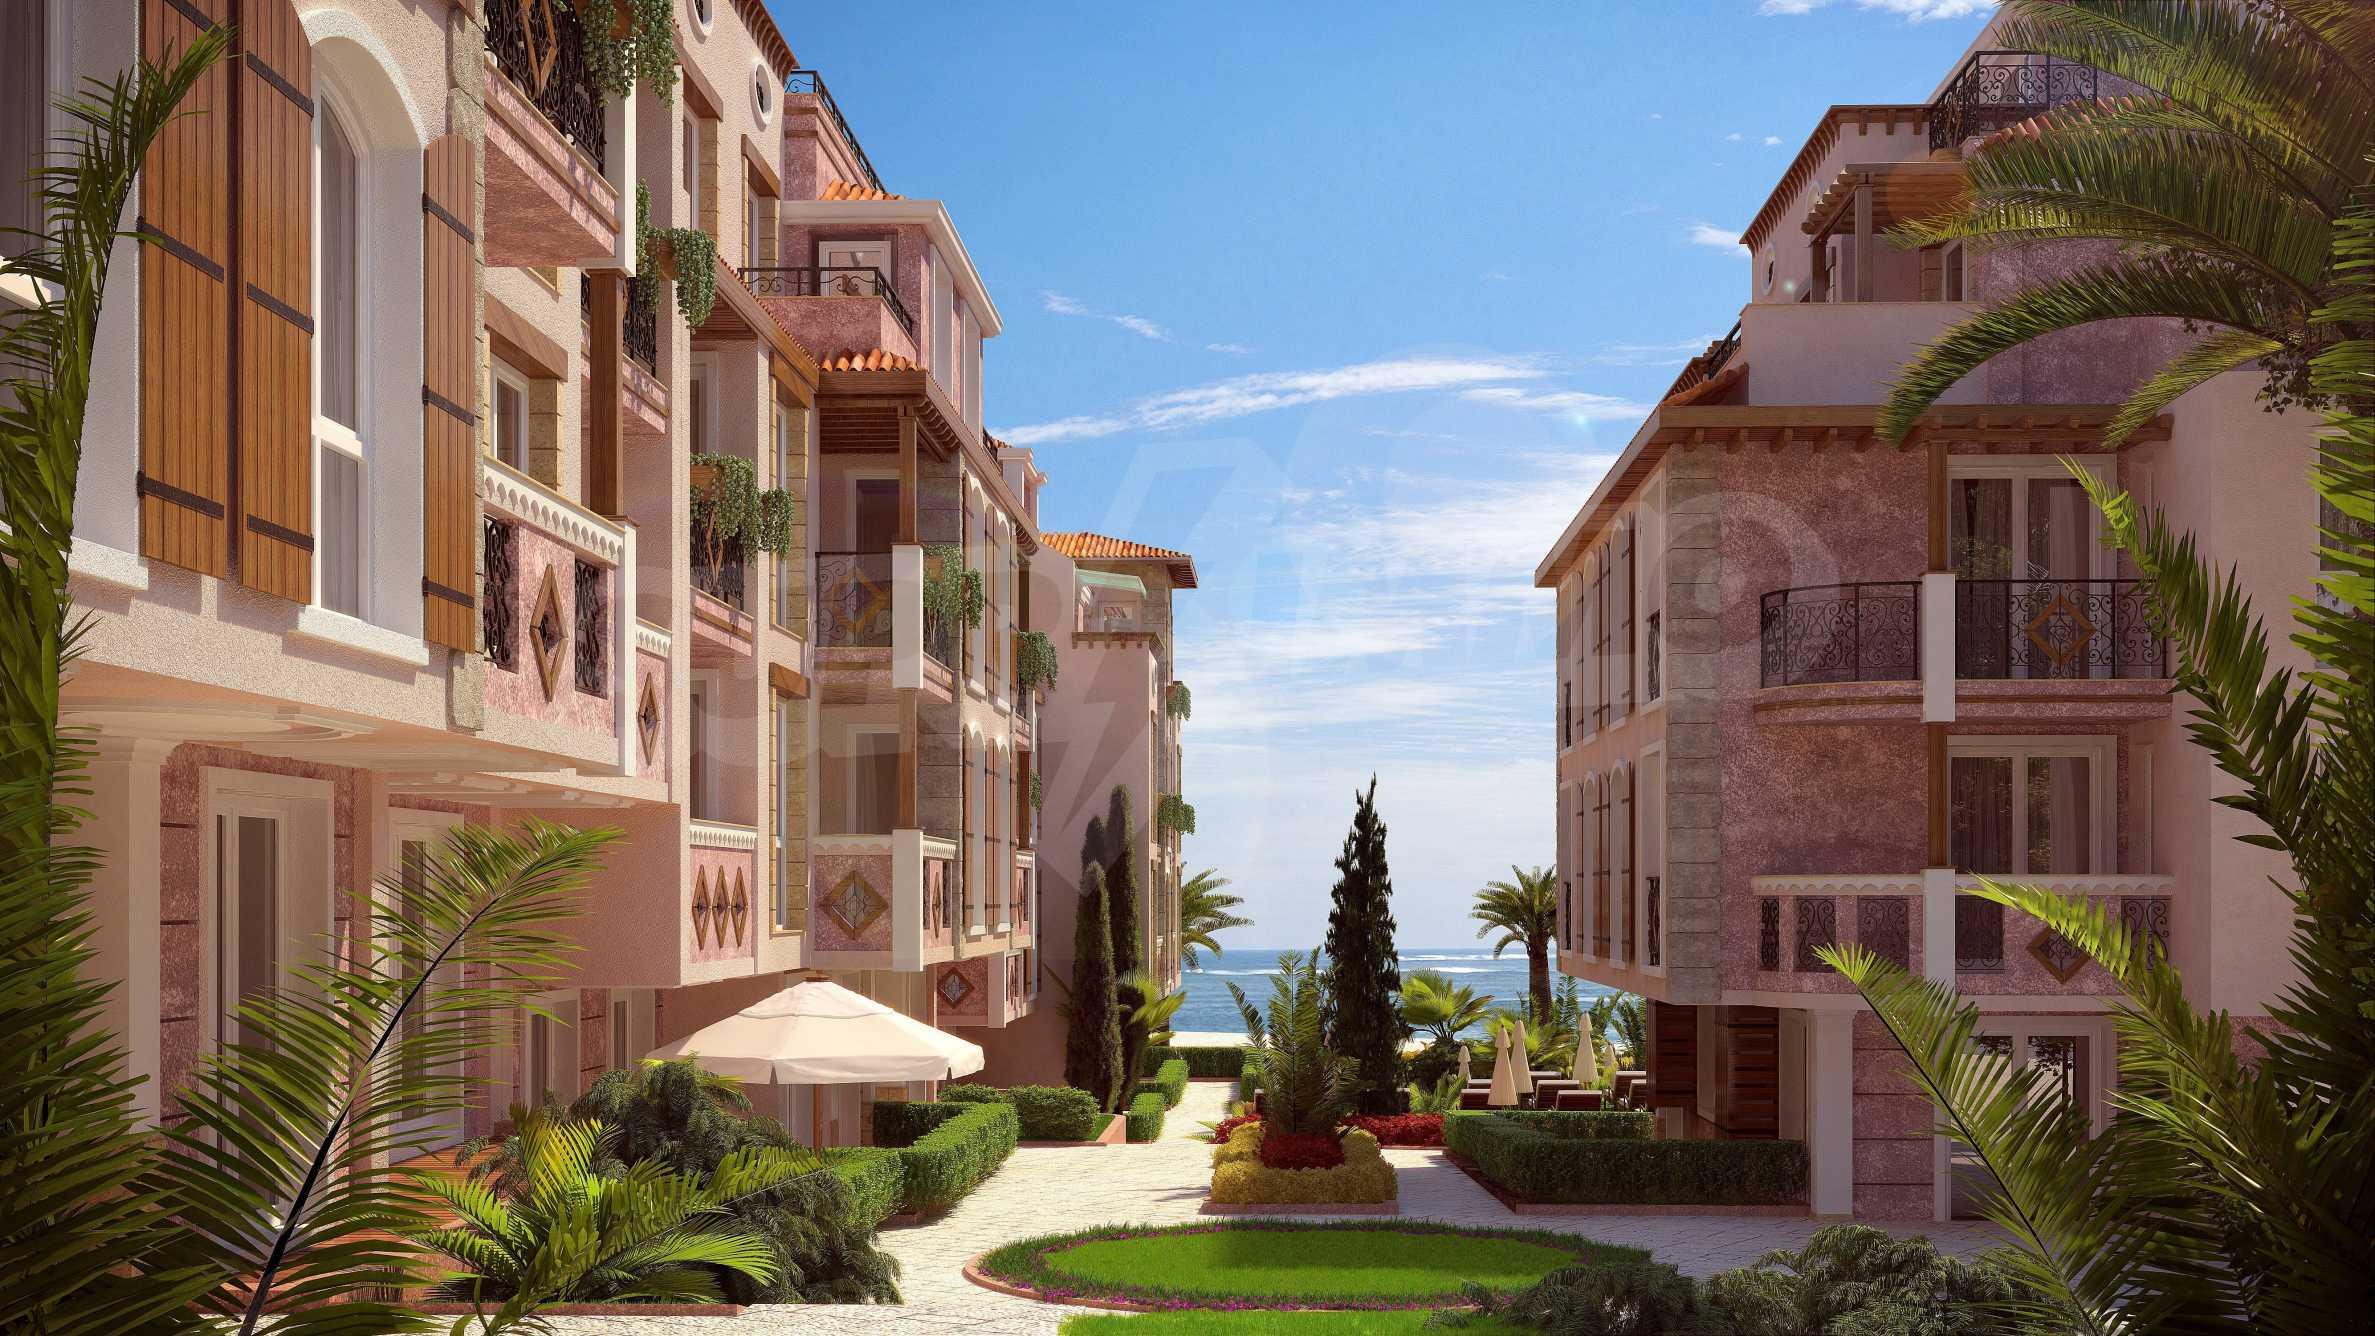 New 1-bedroom apartment in a coastal complex by the Kavatsite Beach (Sozopol) 25